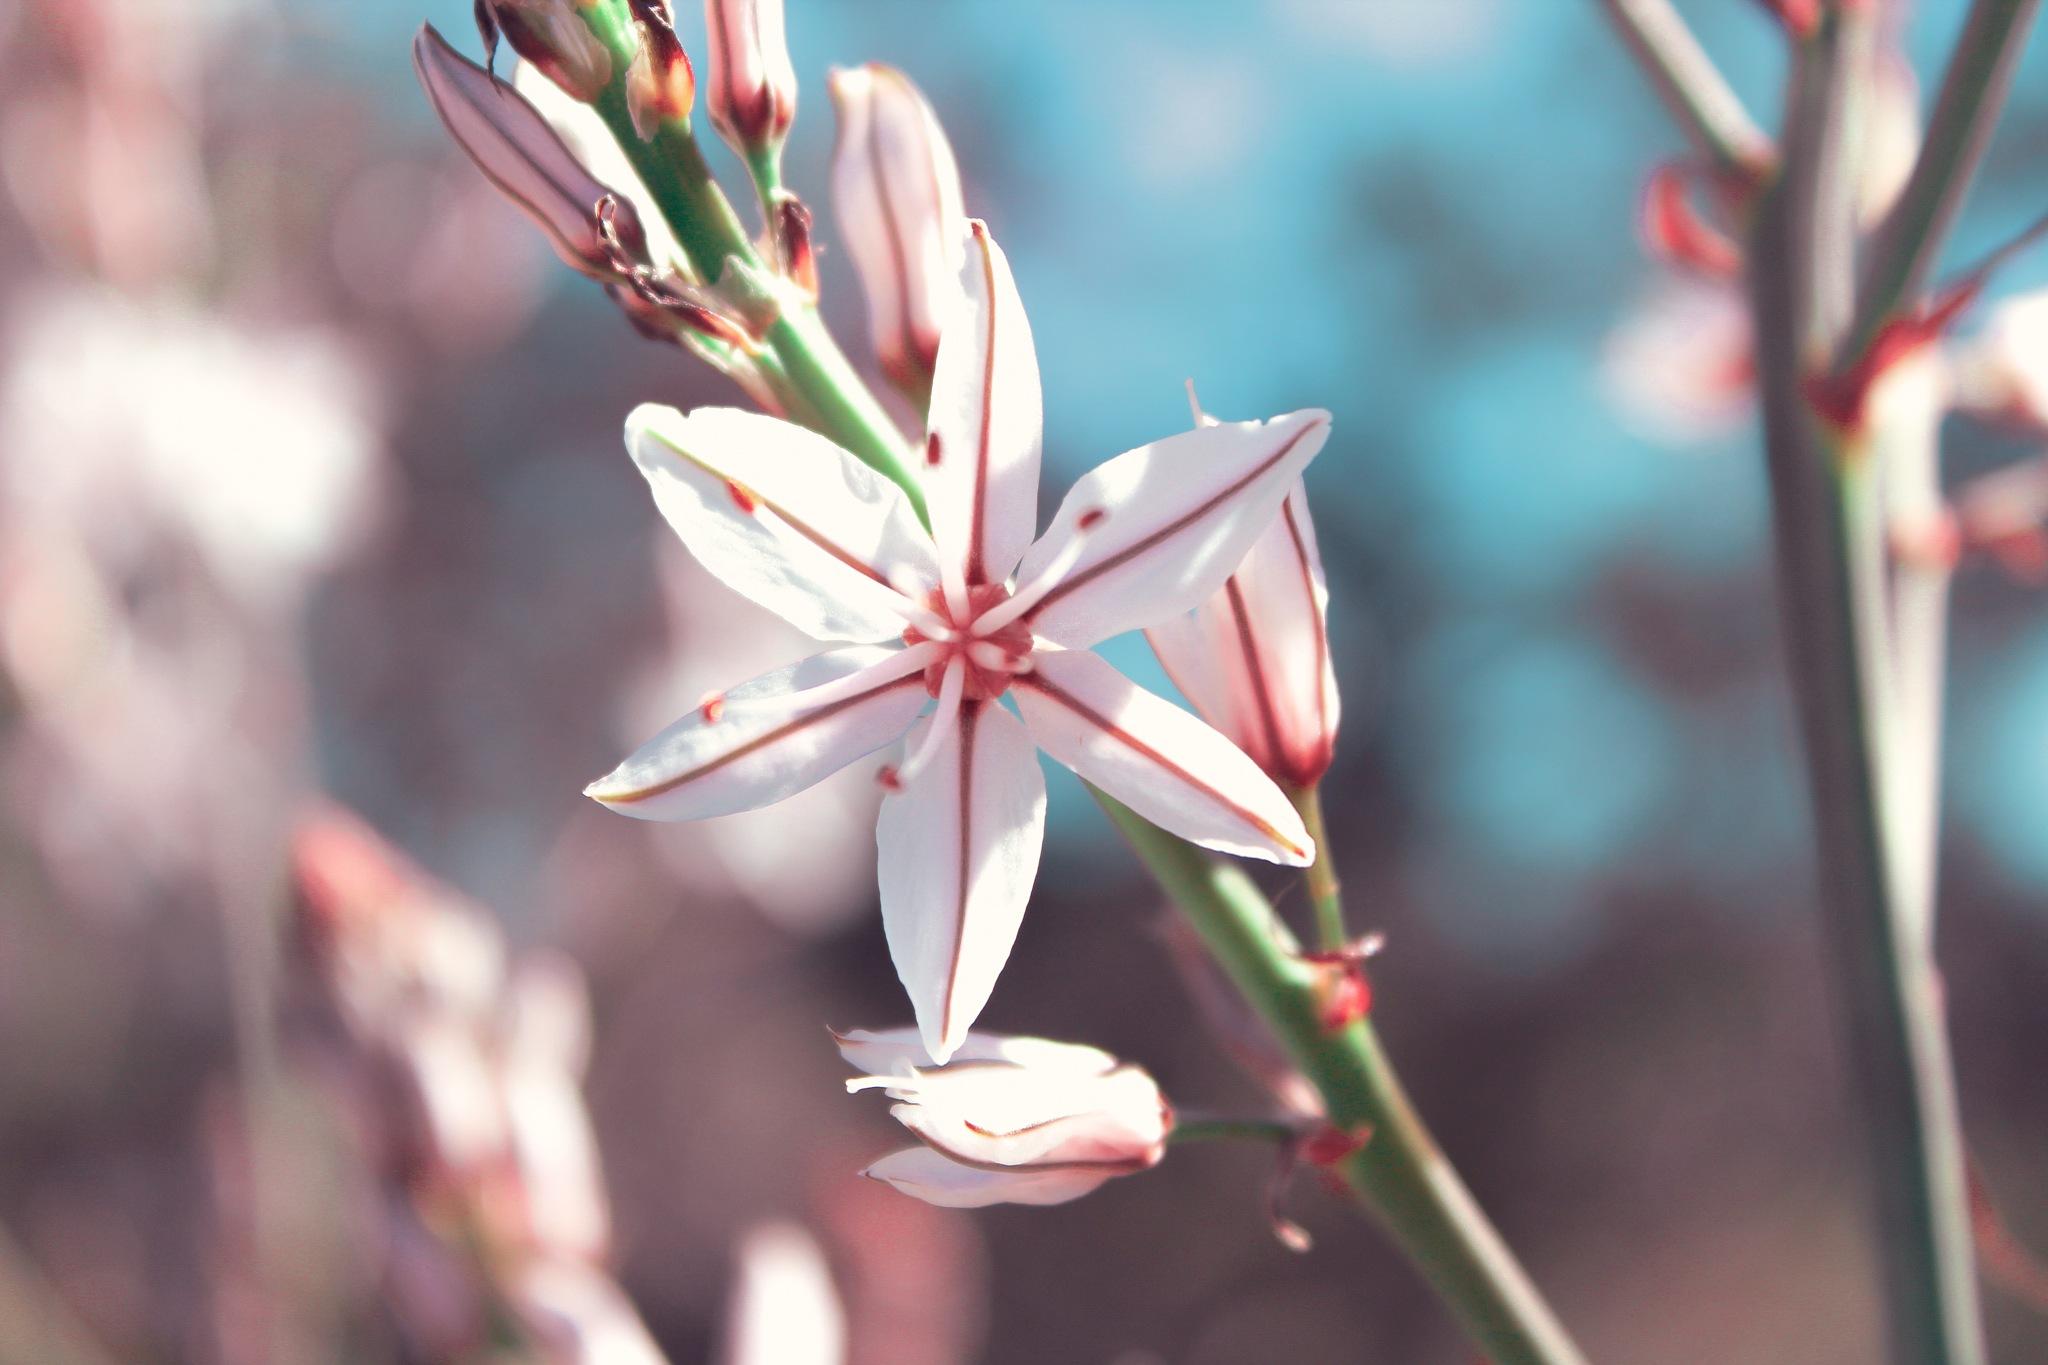 Flower, Macro photography  by Danae Petrides